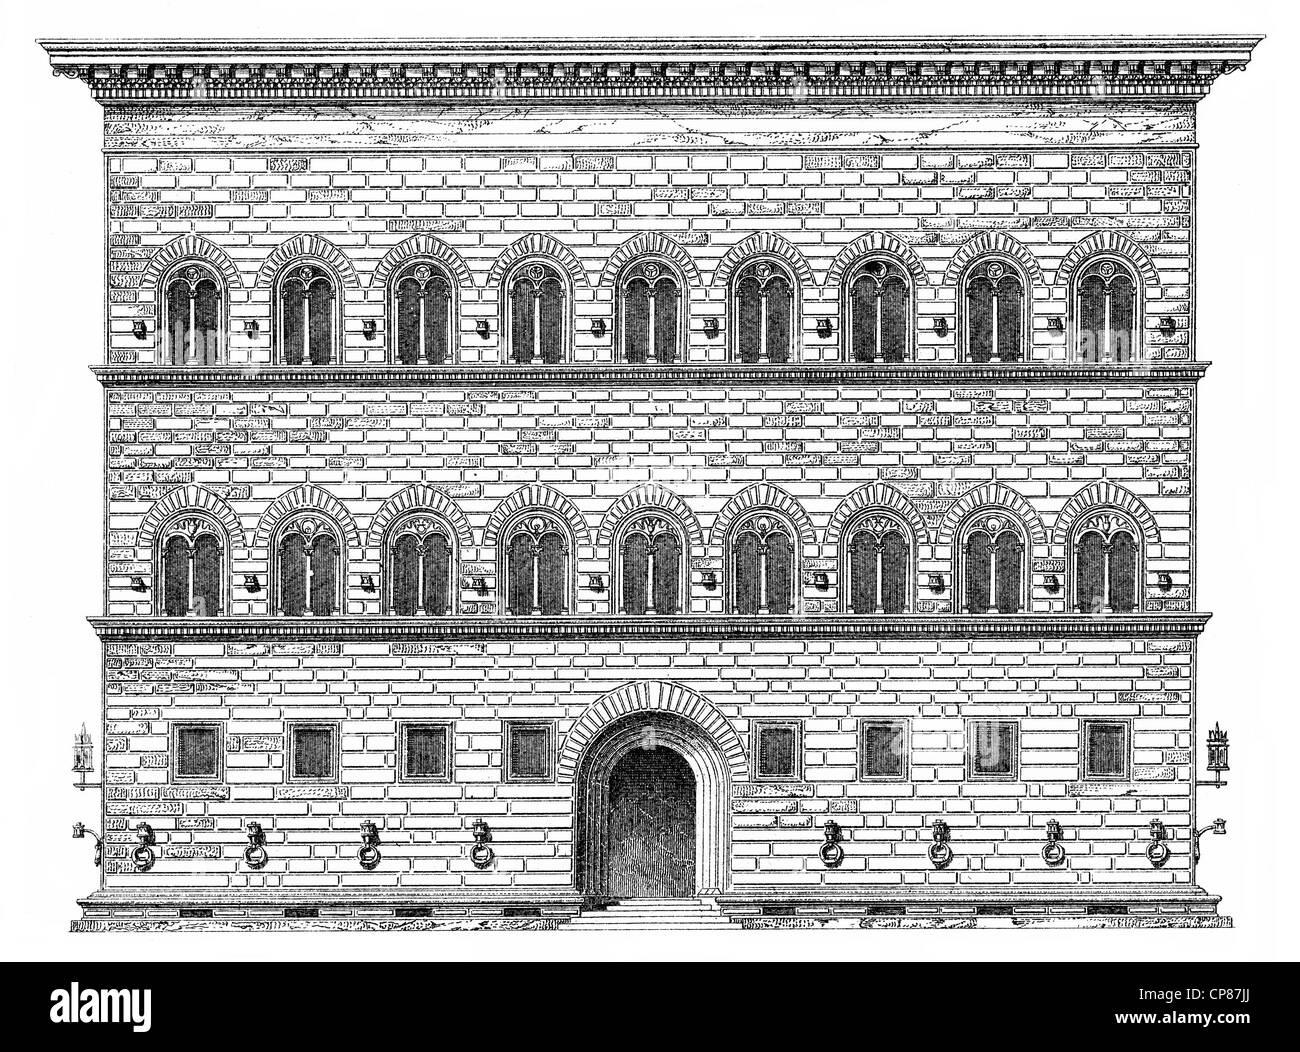 Palacio renacentista Palazzo Strozzi, en Florencia, Italia, del siglo XV, Historische, zeichnerische Darstellung, Imagen De Stock